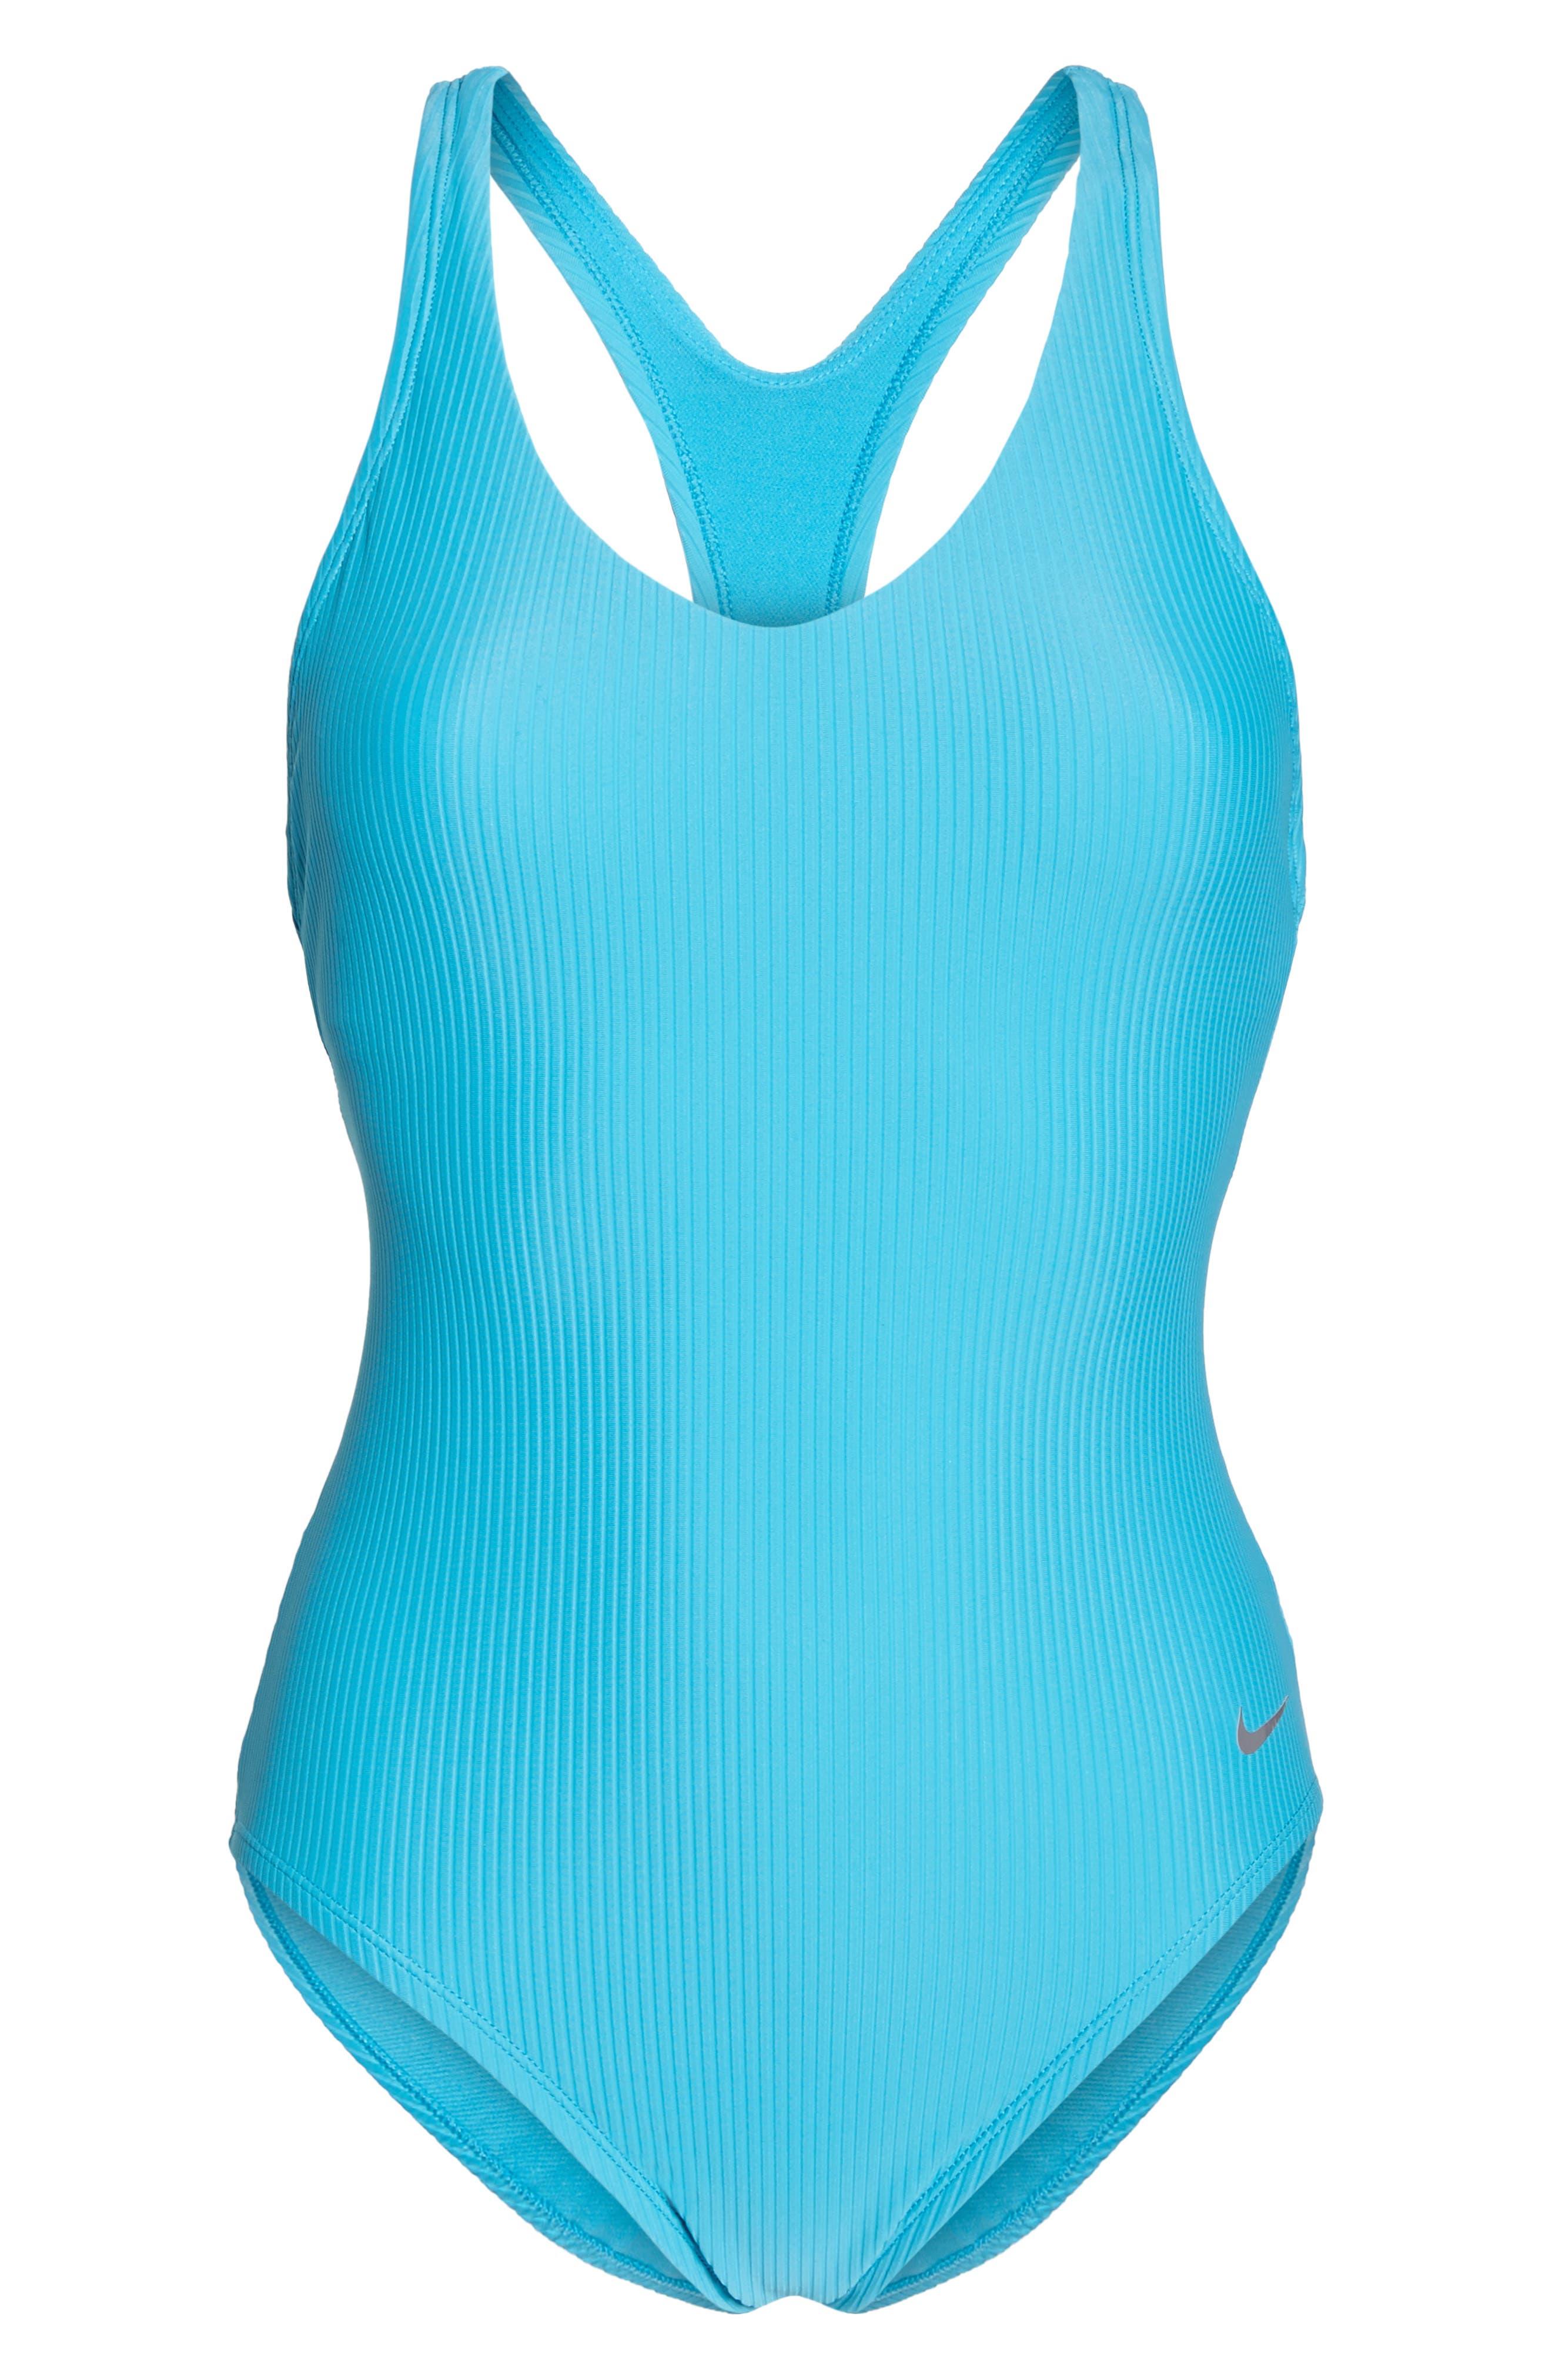 Swim Ribbed One-Piece Swimsuit,                             Alternate thumbnail 6, color,                             LIGHT BLUE FURY